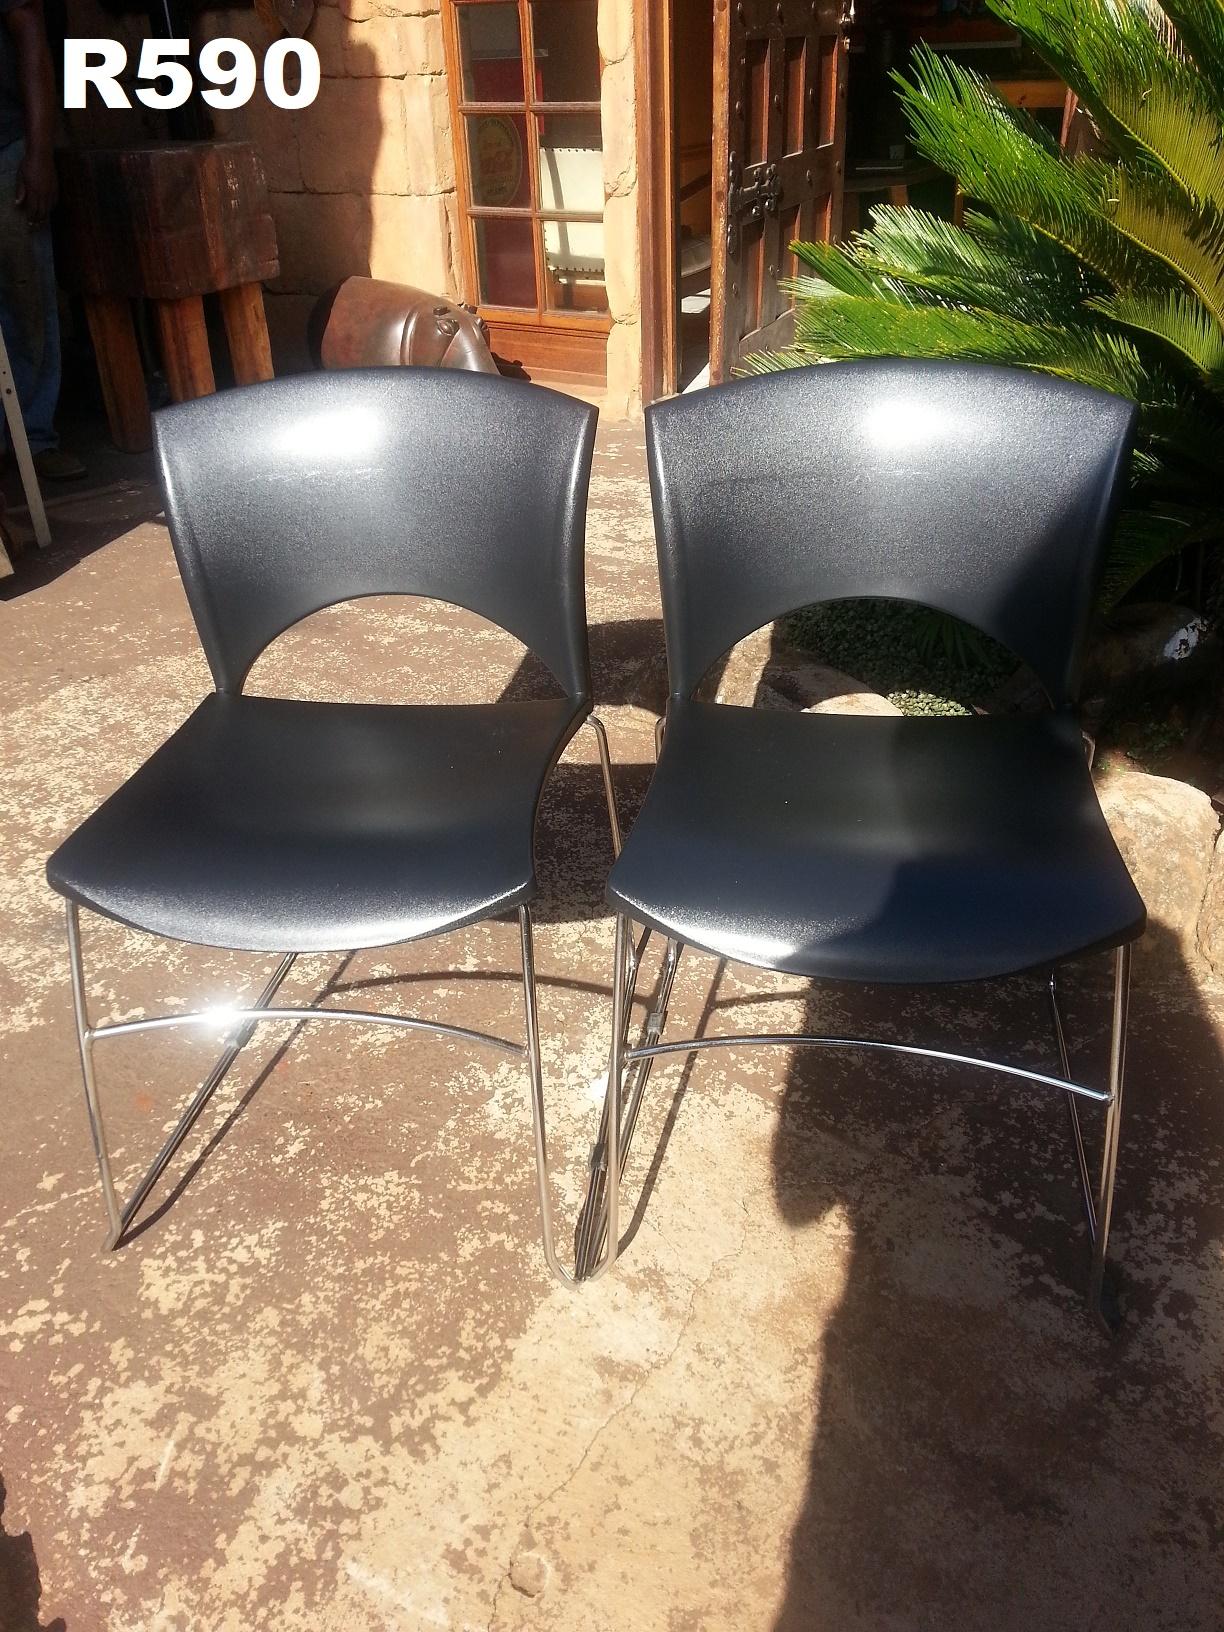 2 x Comfort Chairs